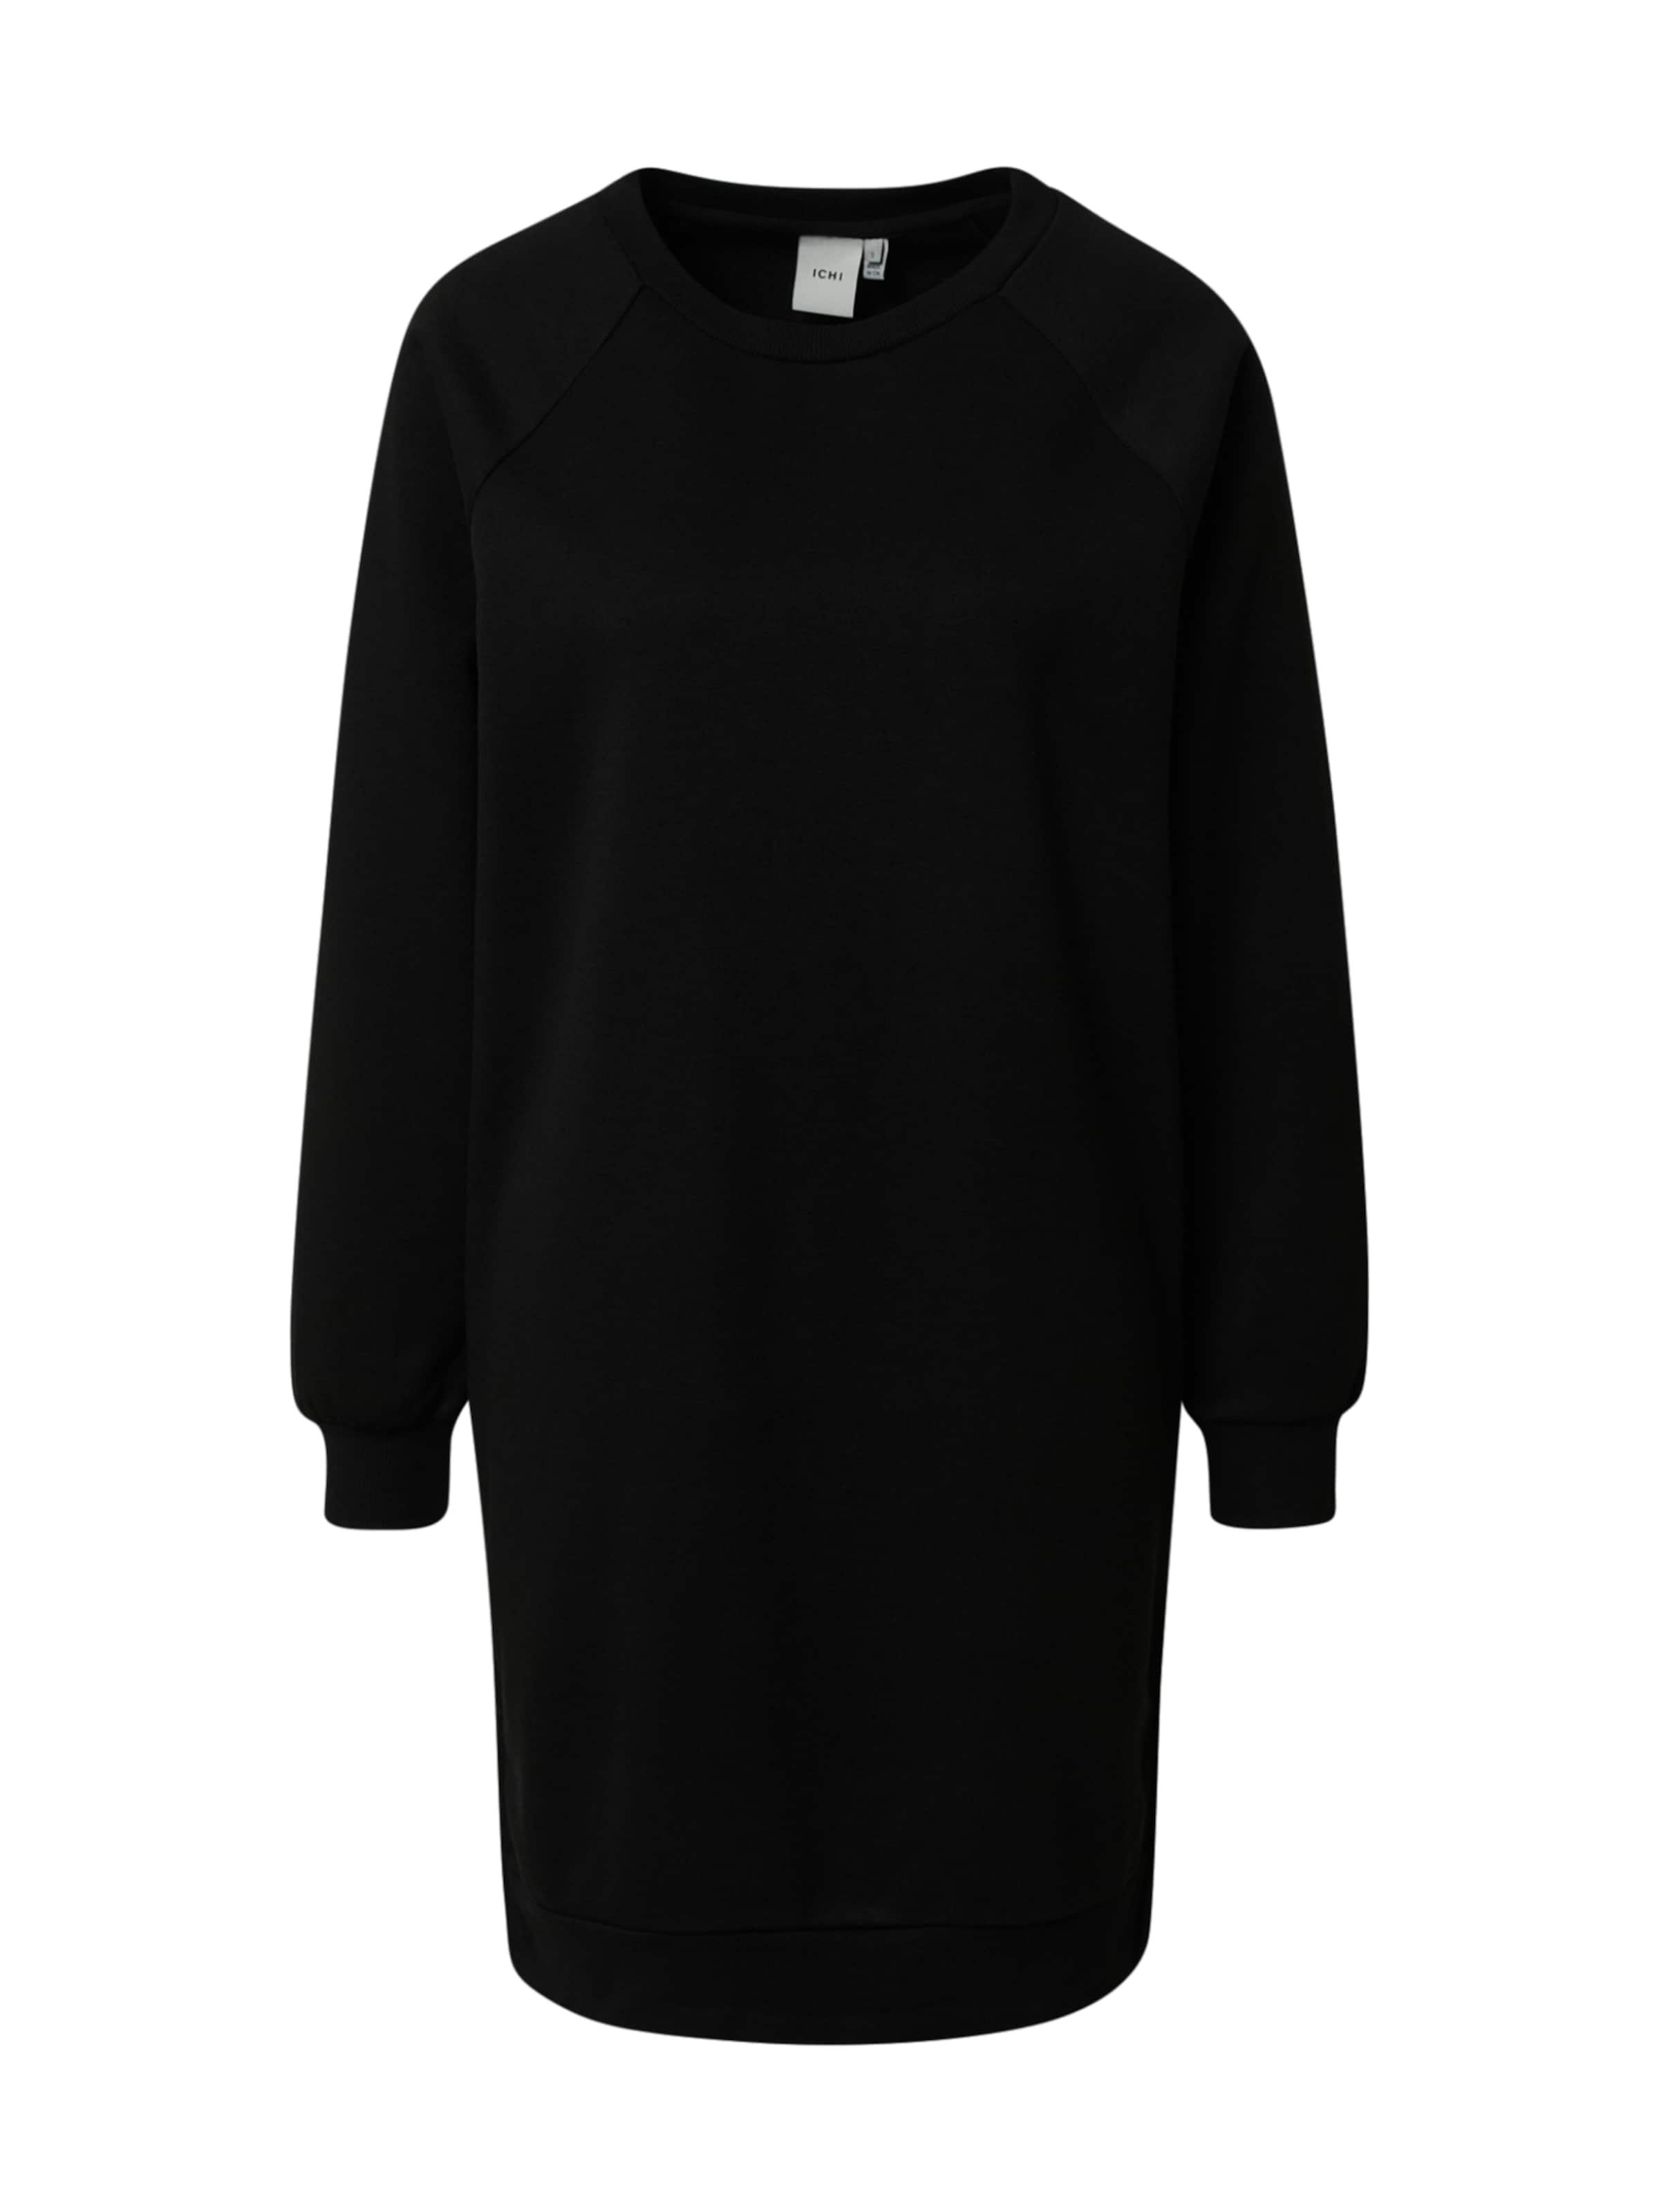 ICHI Skjortklänning i svart